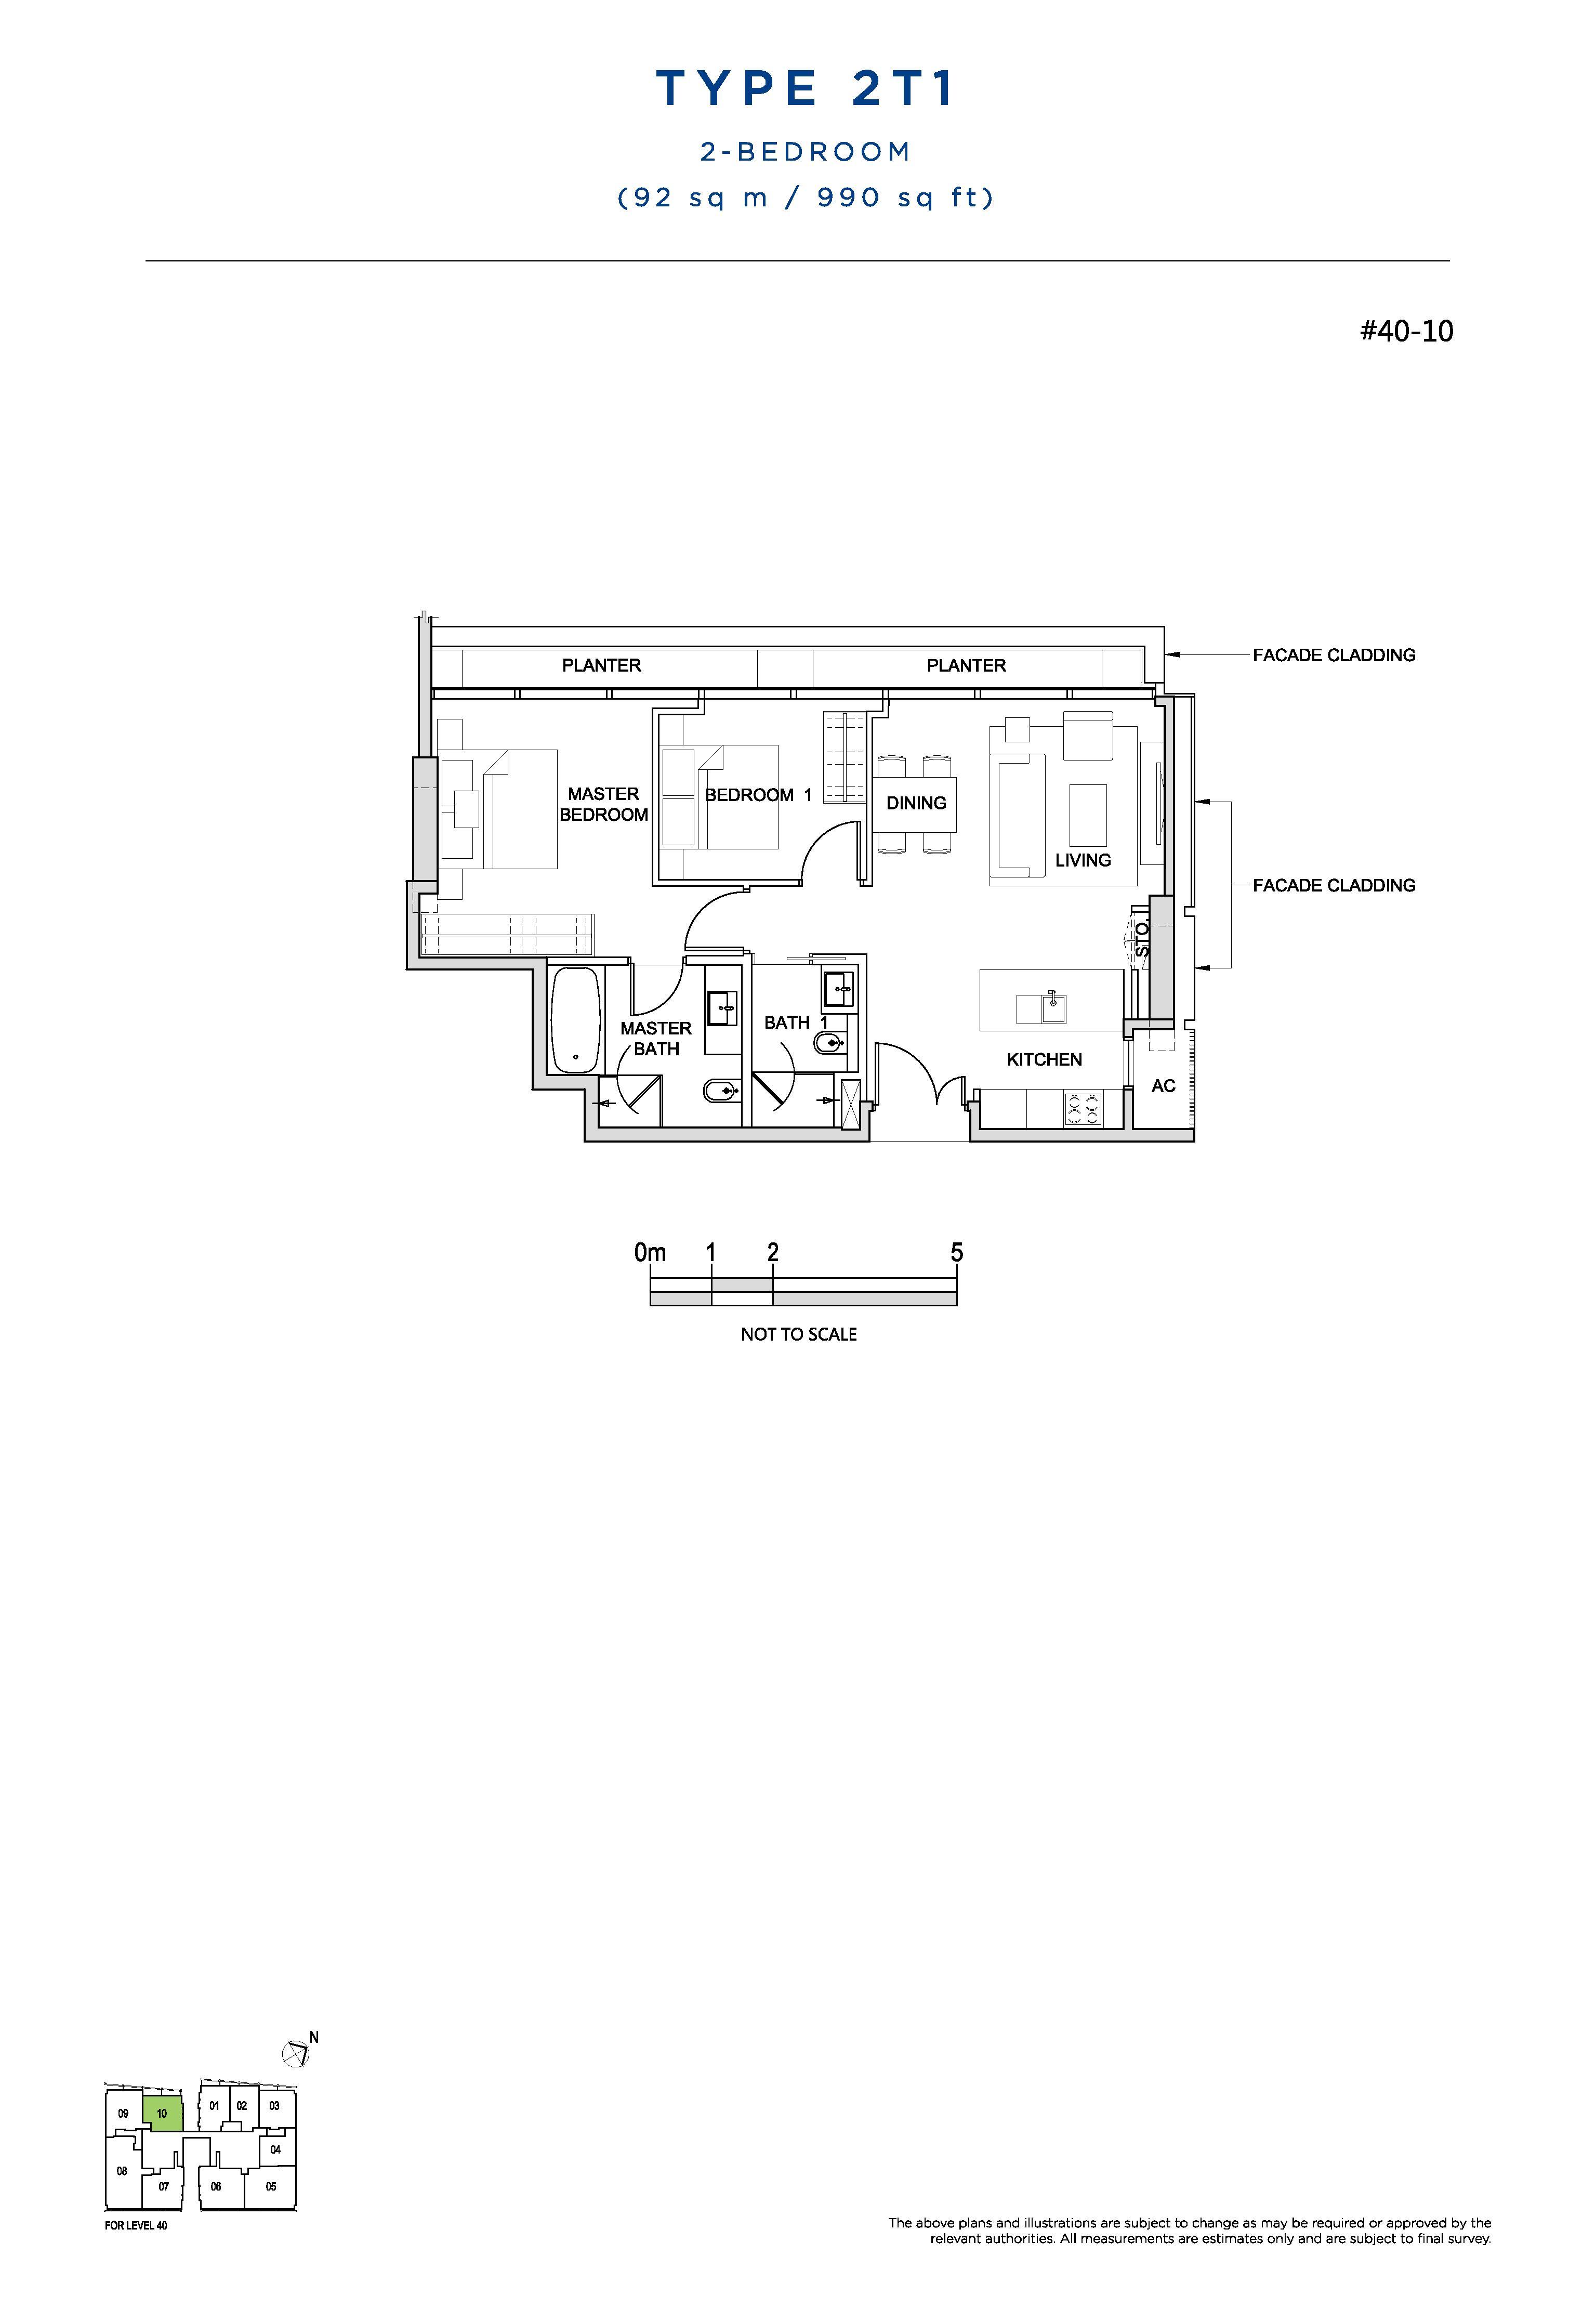 South Beach Residences 2 Bedroom Floor Plans Type 2T1